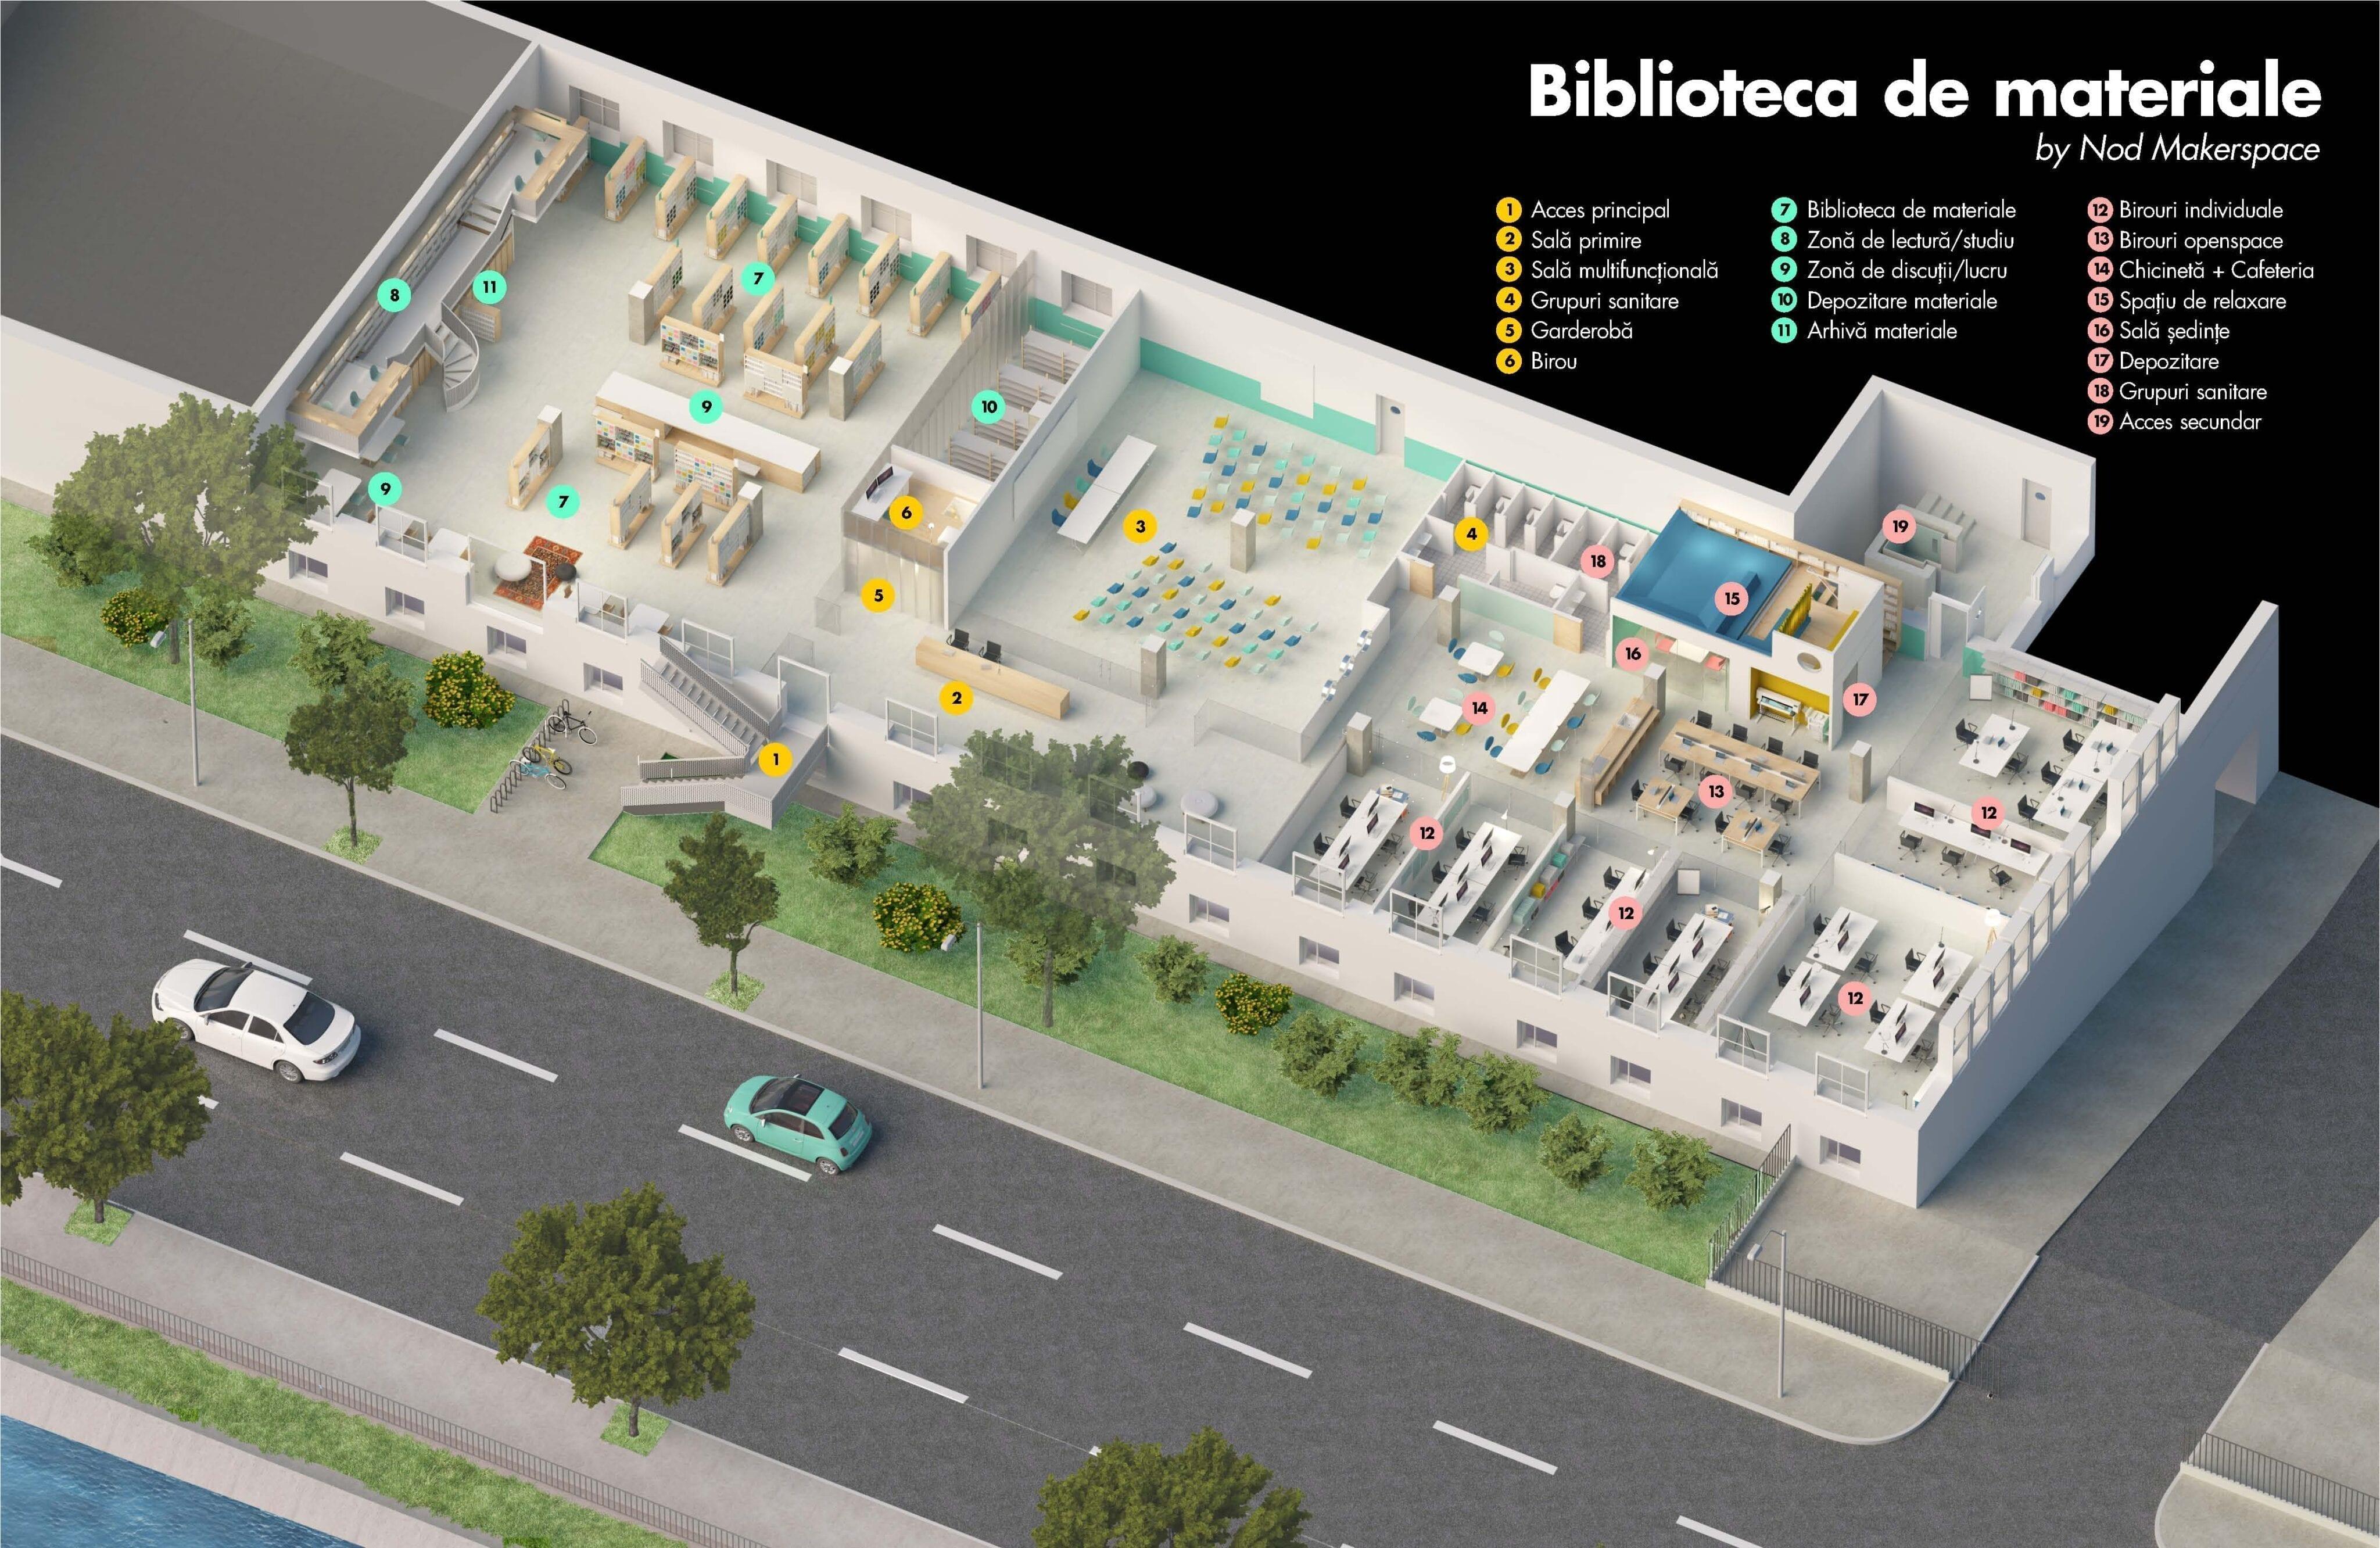 MATER Library - BIBLIOTECA DE MATERIALE NOD Maker space